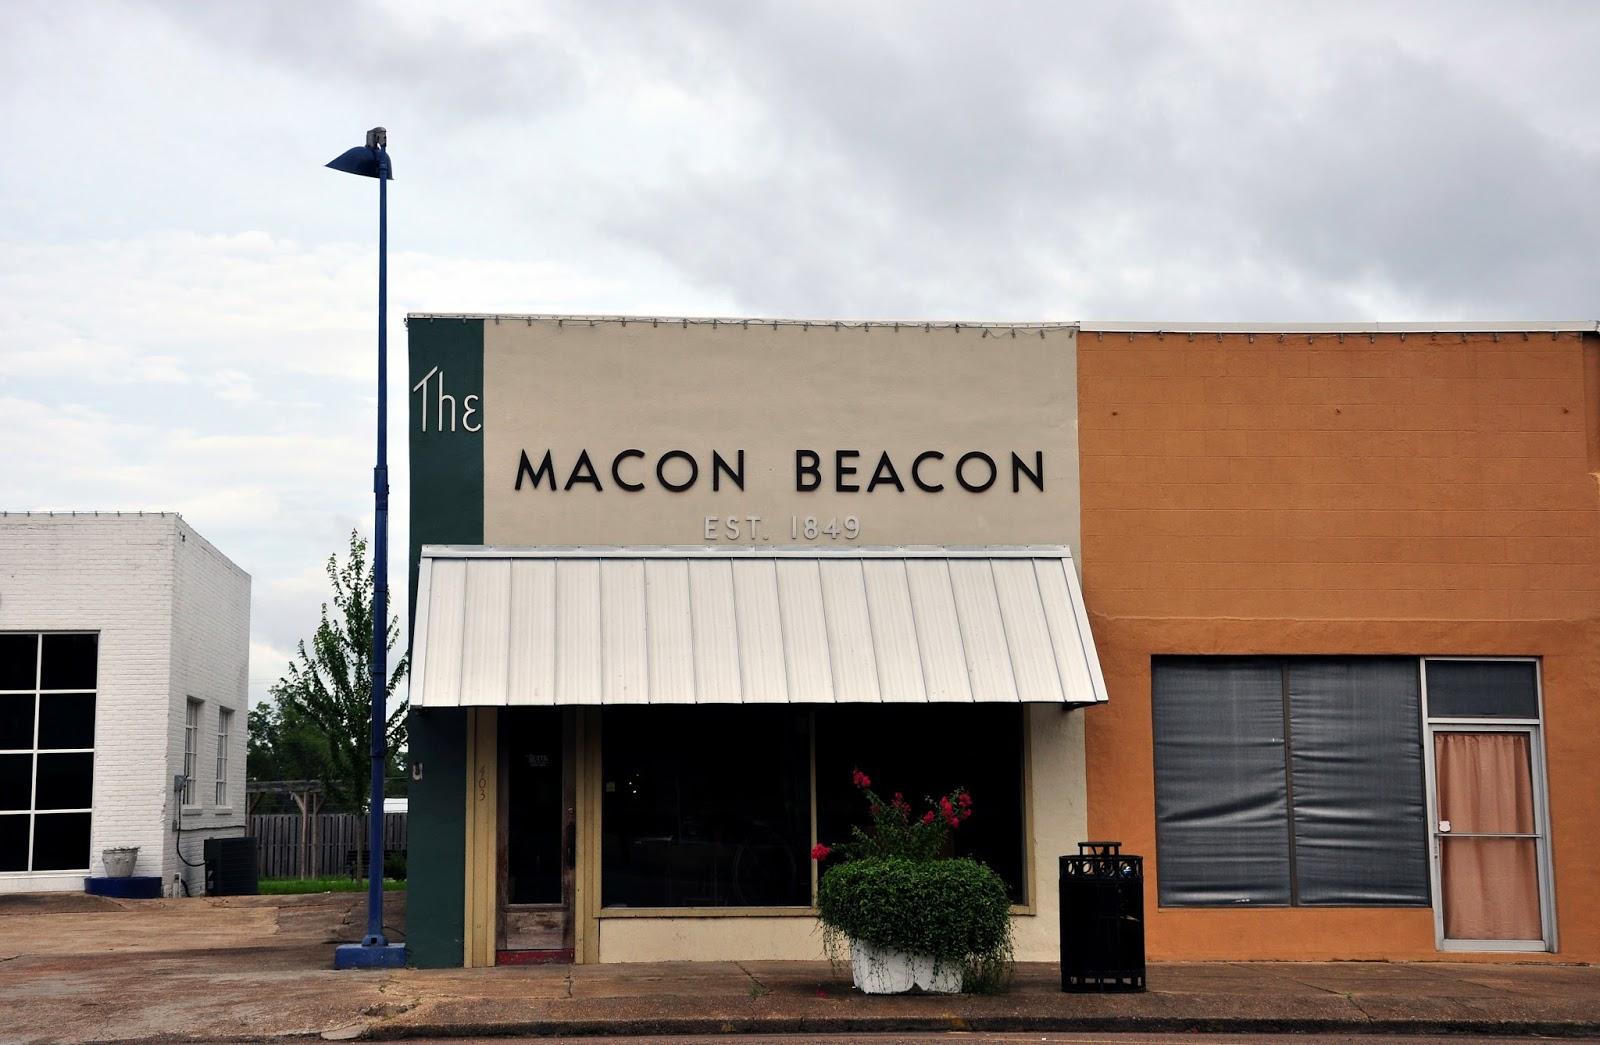 The Macon Beacon @ Hickory Ridge Studio